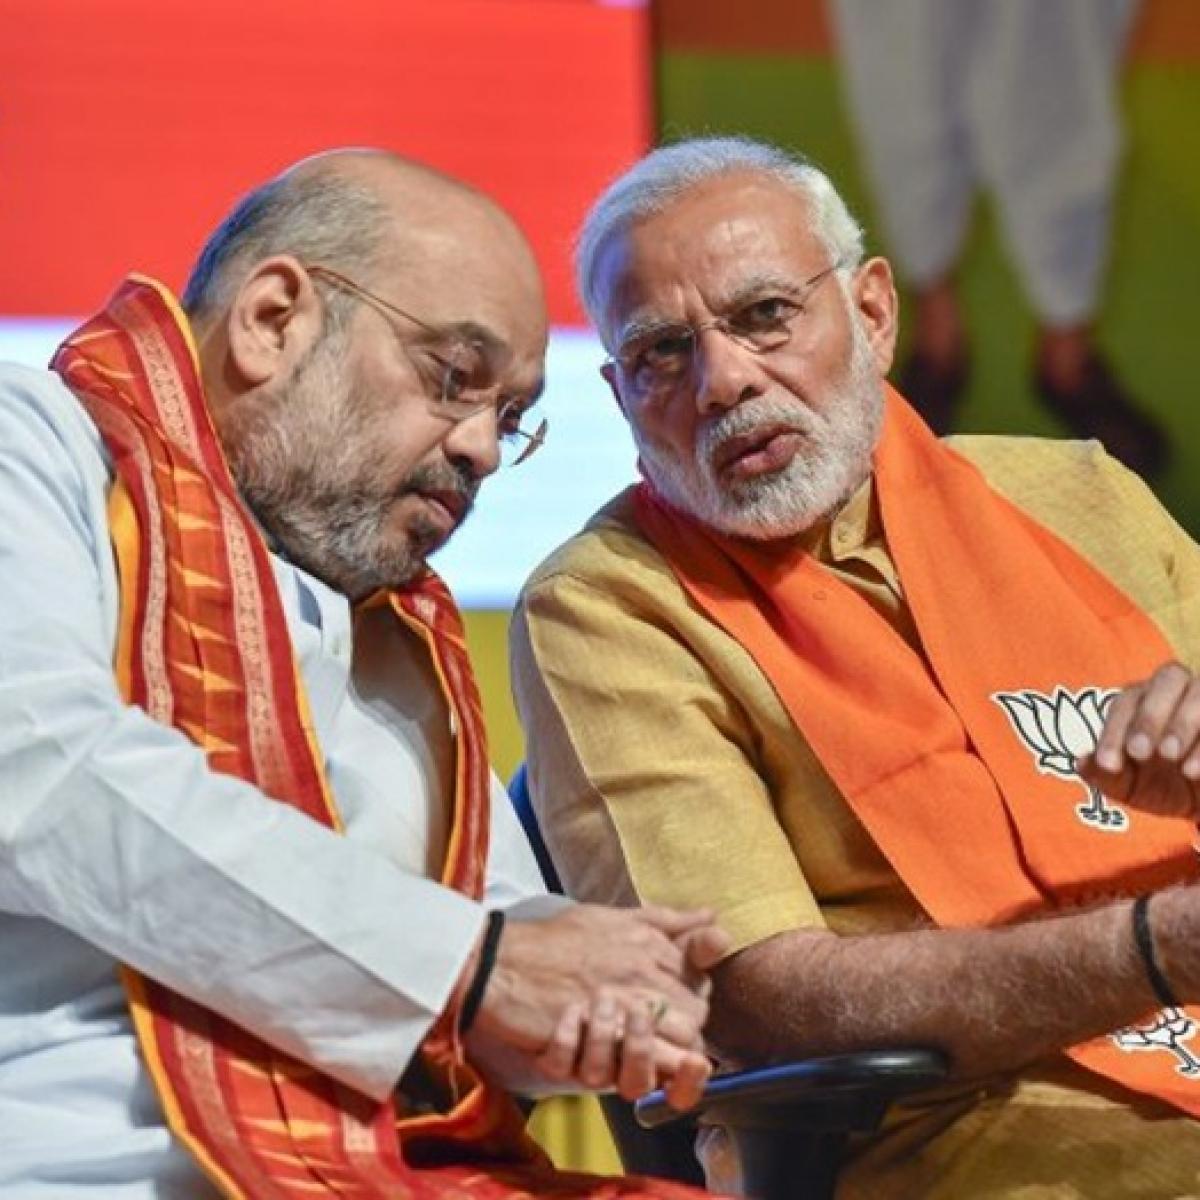 Citizenship (Amendment) Bill: How many trust votes does BJP need in Rajya Sabha to pass the bill